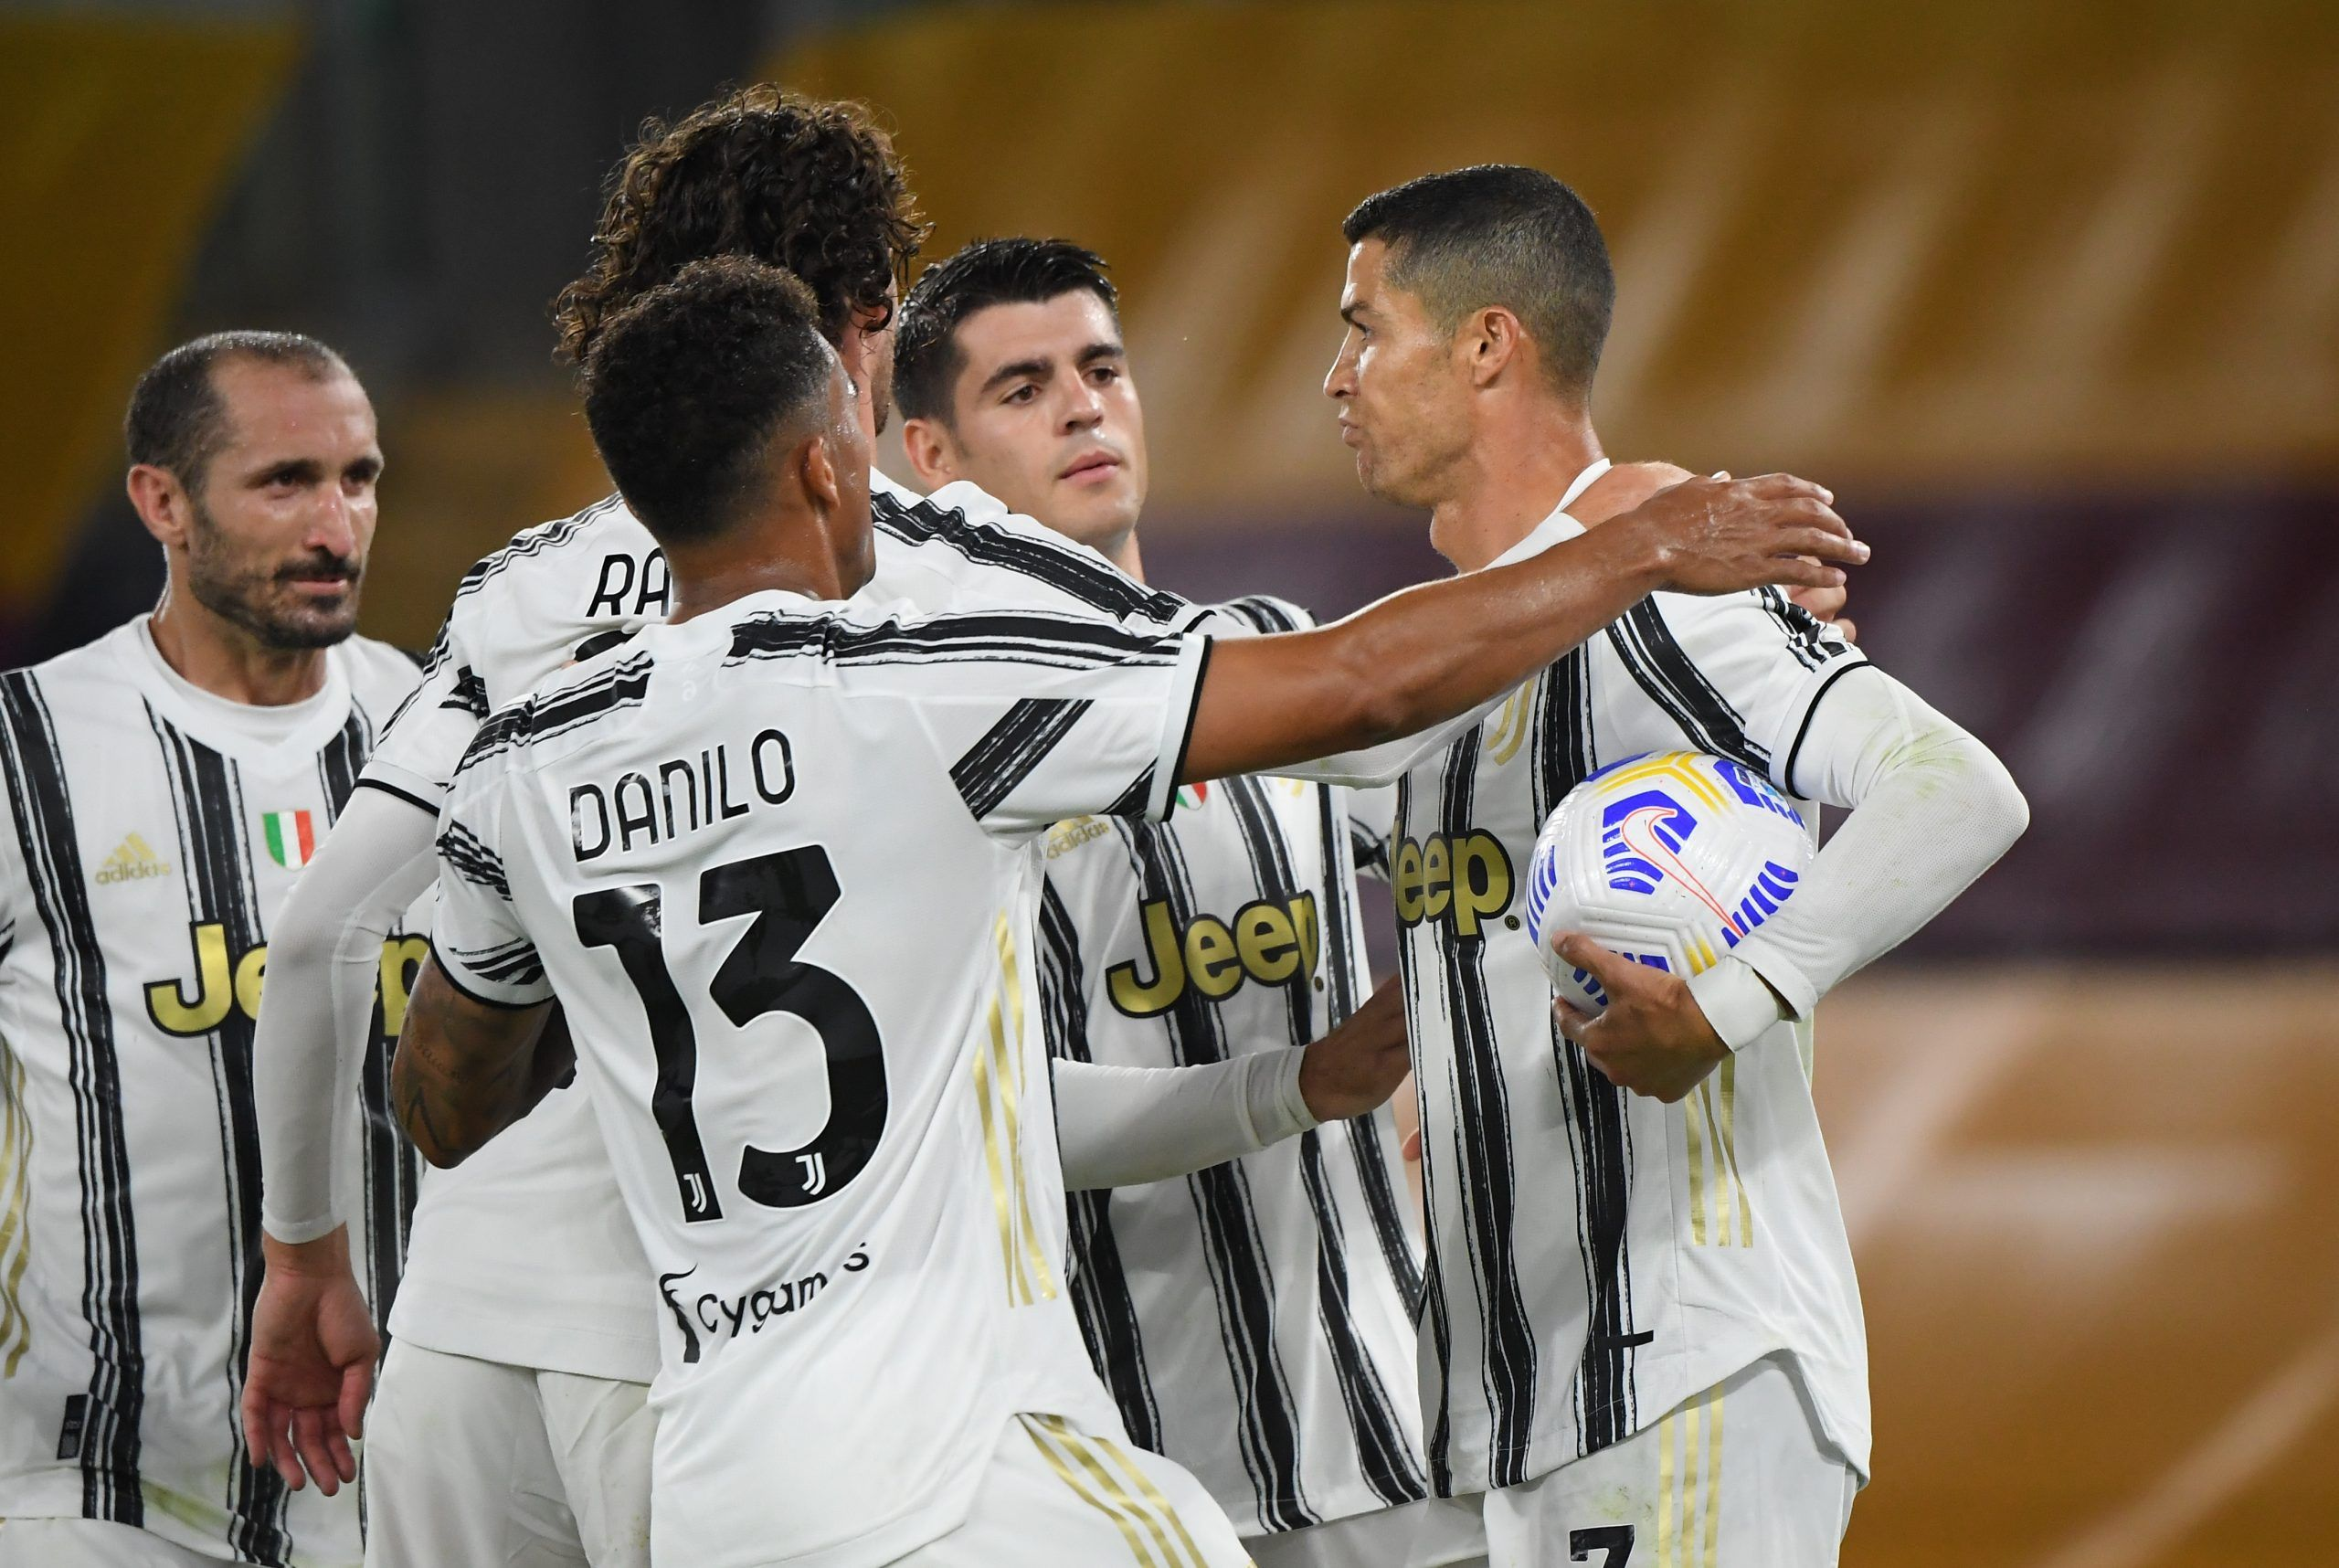 Squad Juventus 2021 Wallpapers - Wallpaper Cave